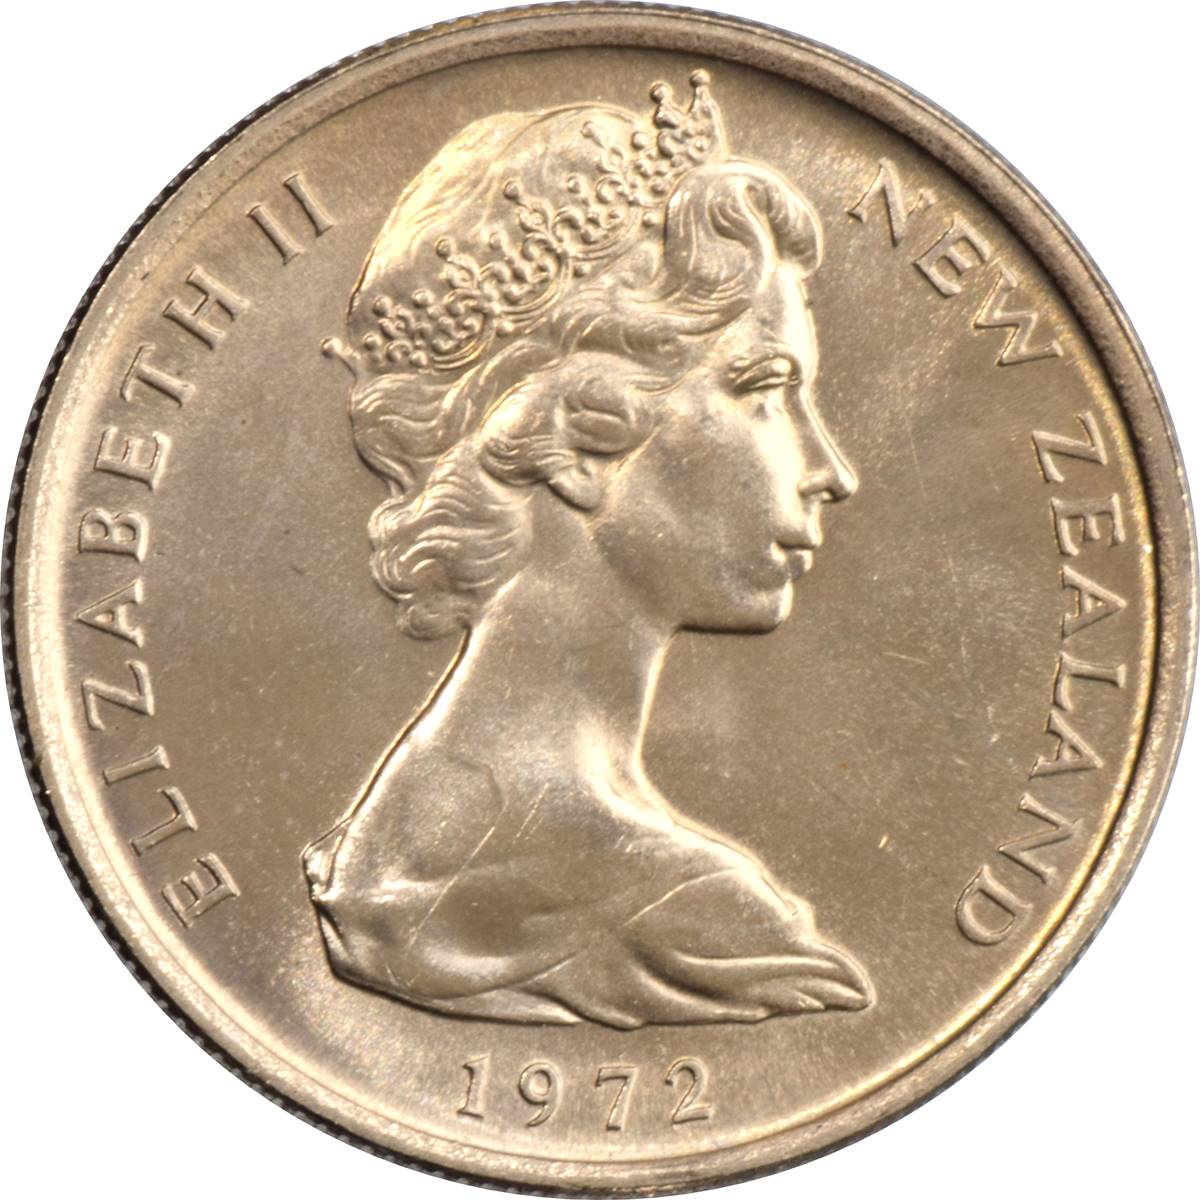 1975 1976 1977 1978 1979 1980 CANADA 5 CENT SET *CHOICE* UNC 6 COINS